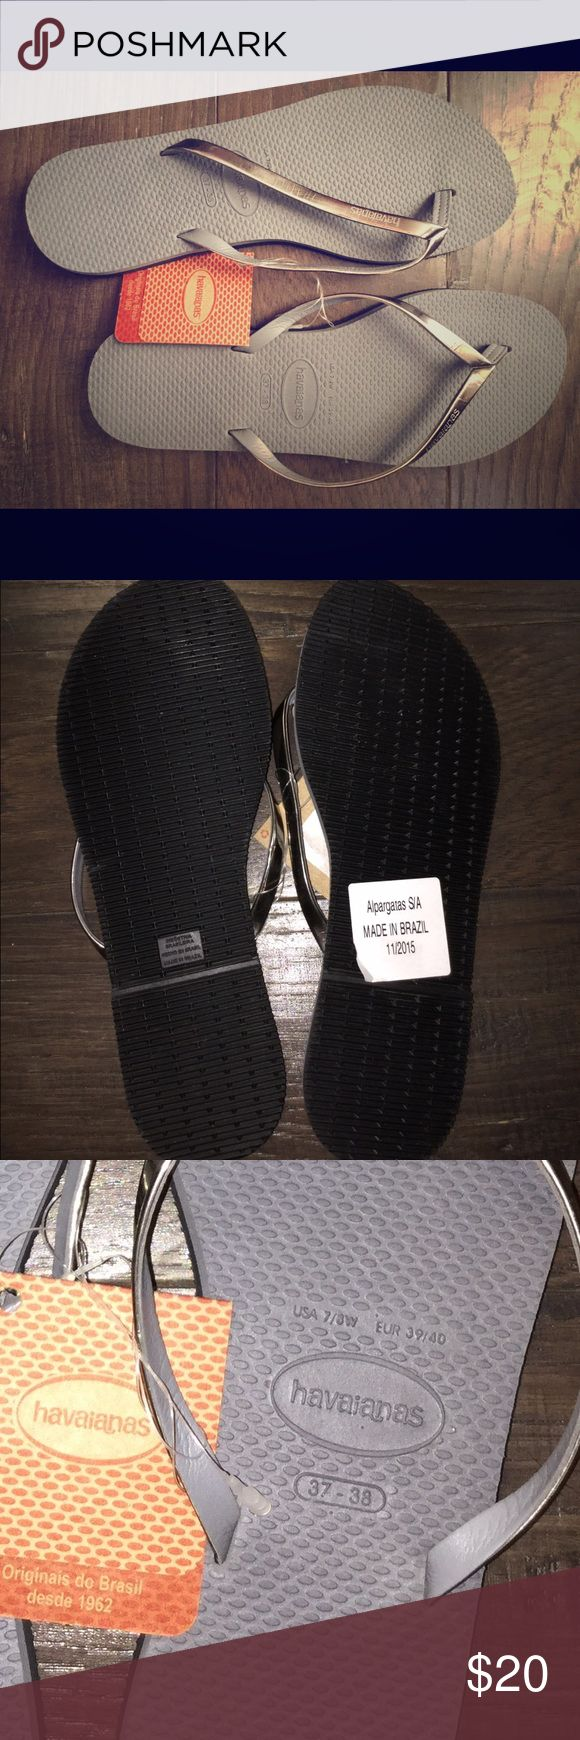 Havaianas metallic flip flops Slim strap, metallic silver havaianas with tags. Never worn, size 7/8. Havaianas Shoes Sandals